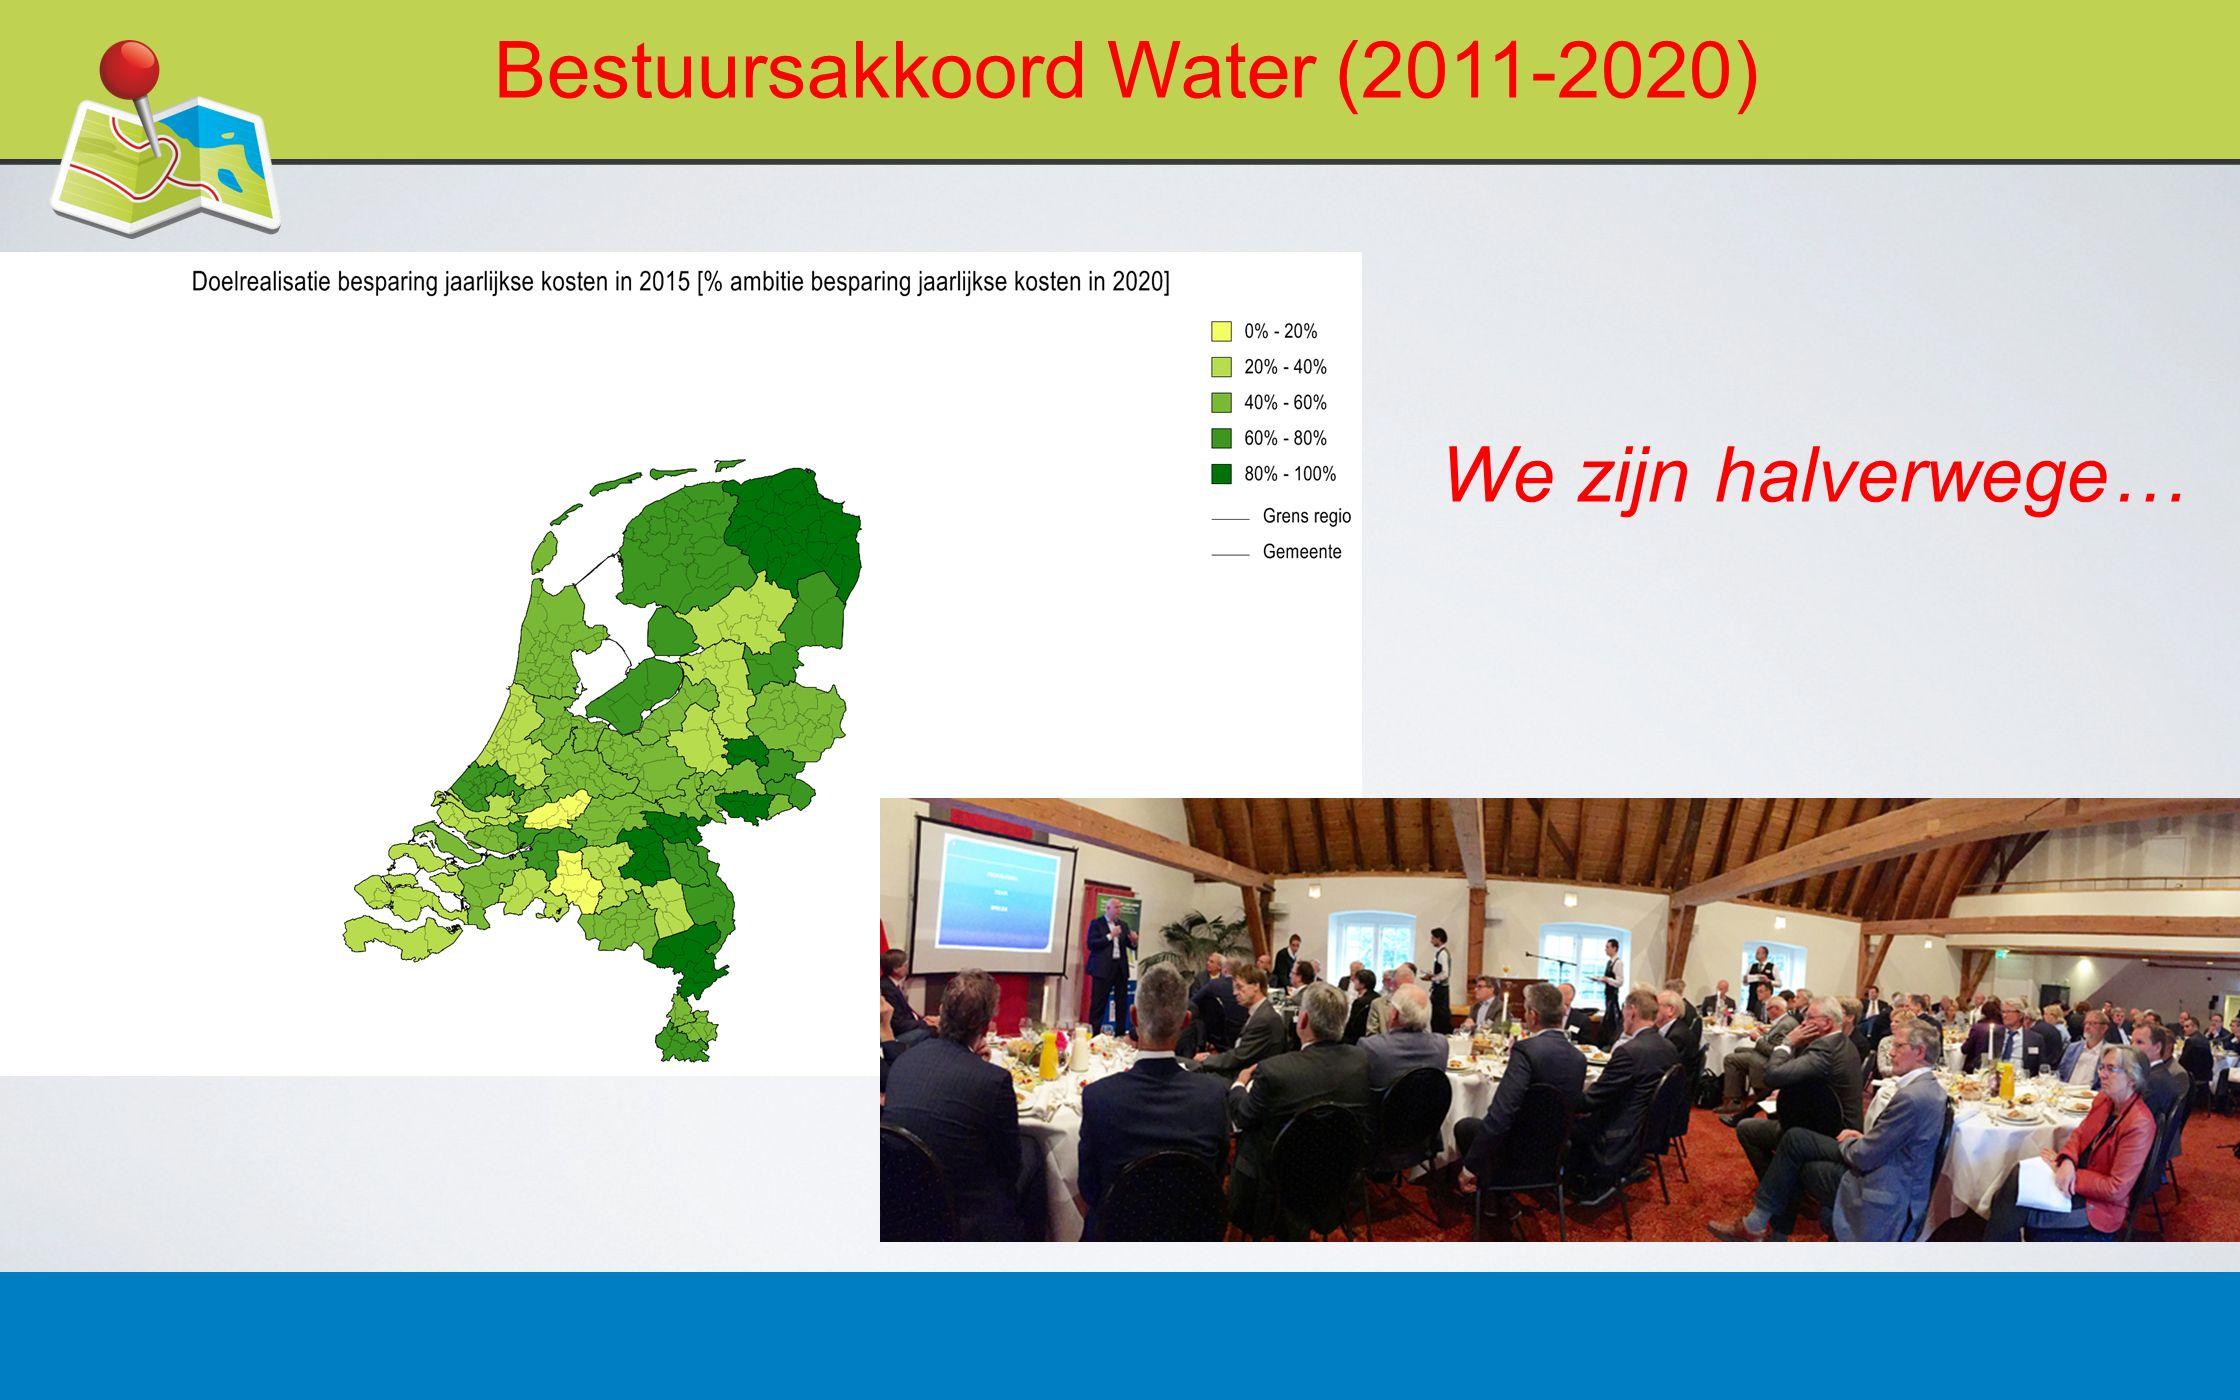 Bestuursakkoord Water (2011-2020)